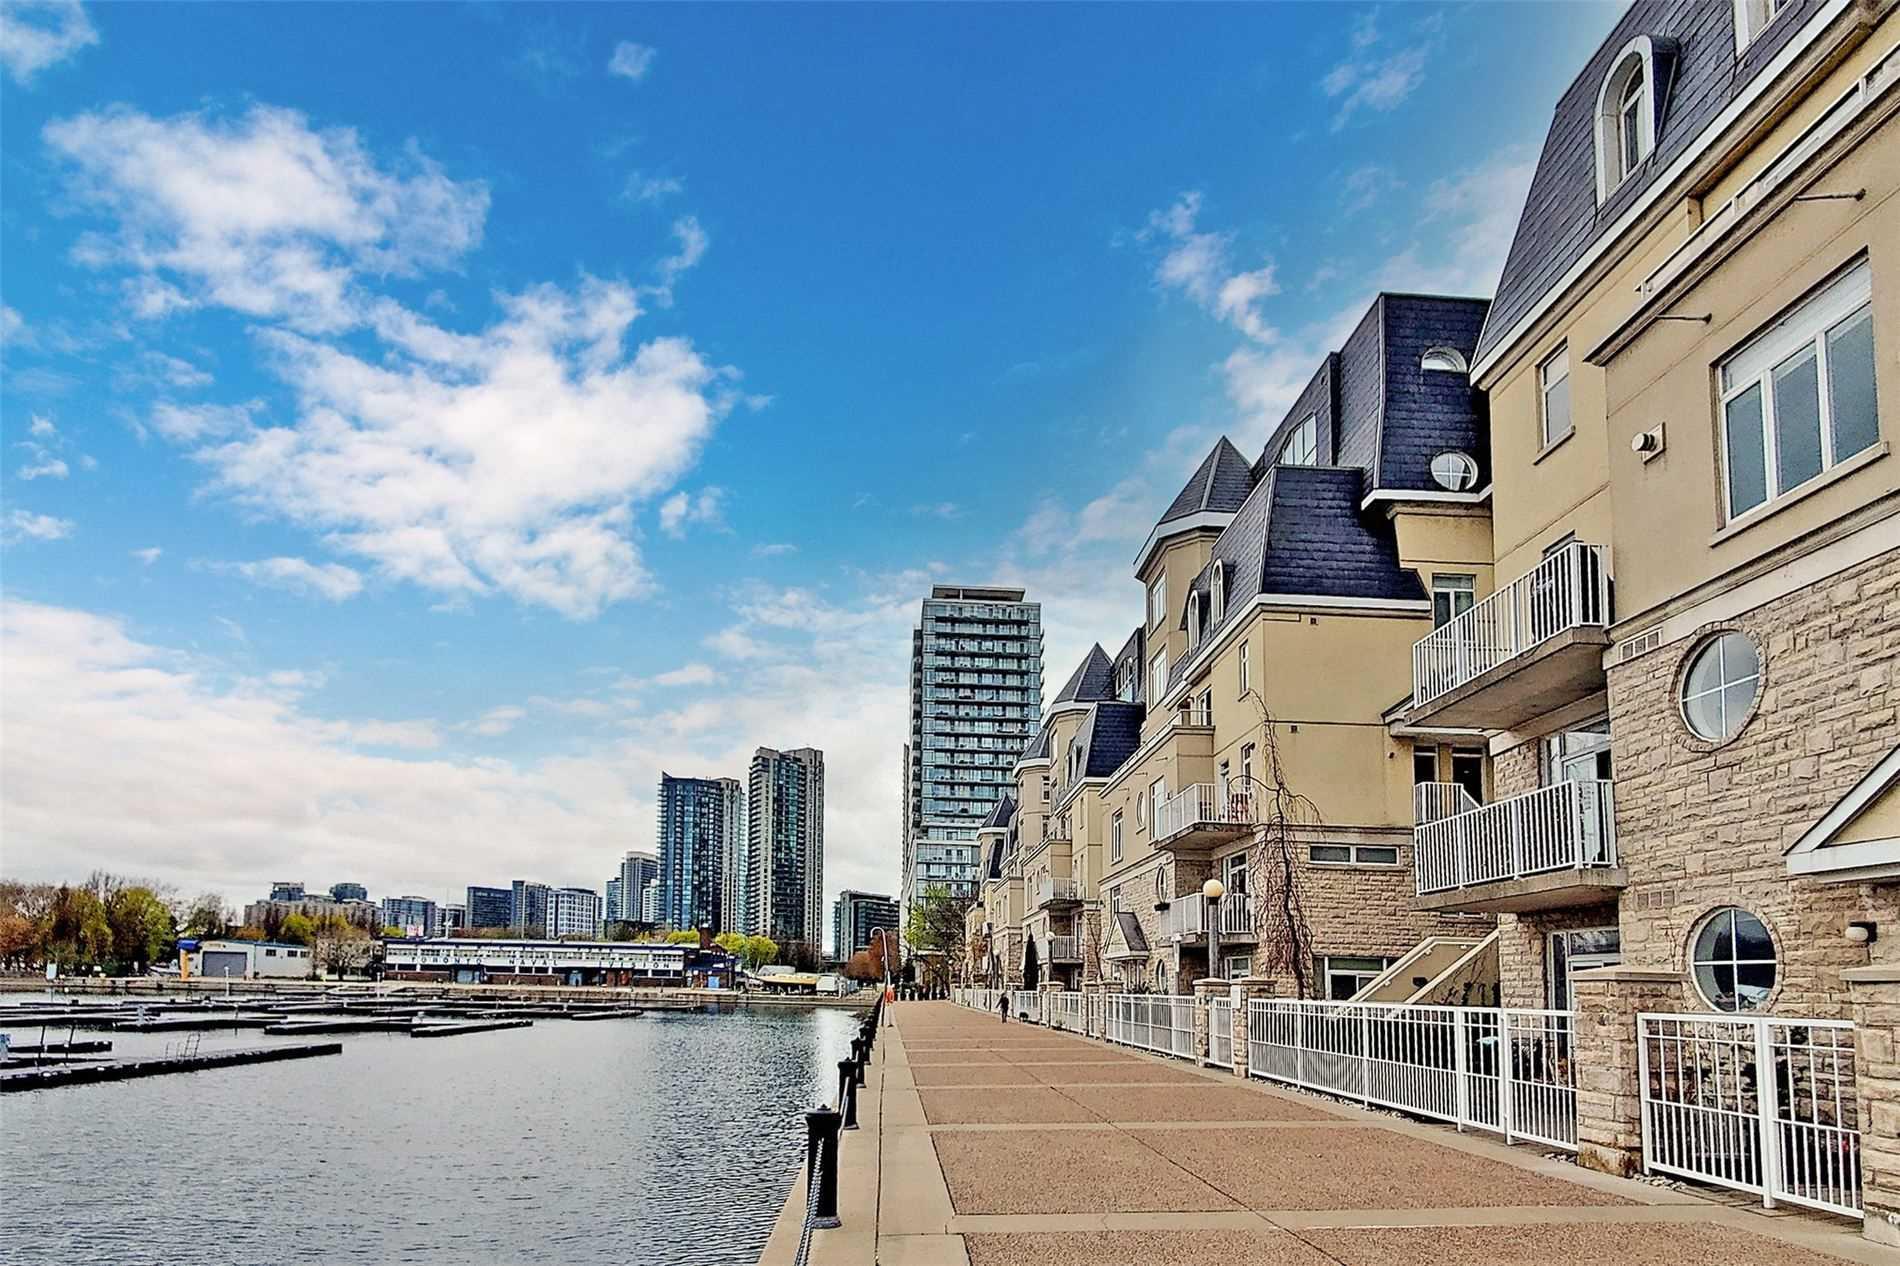 House For Sale Unit 267, 30 Stadium Rd, M5V 3P4, Waterfront Communities C1, Toronto